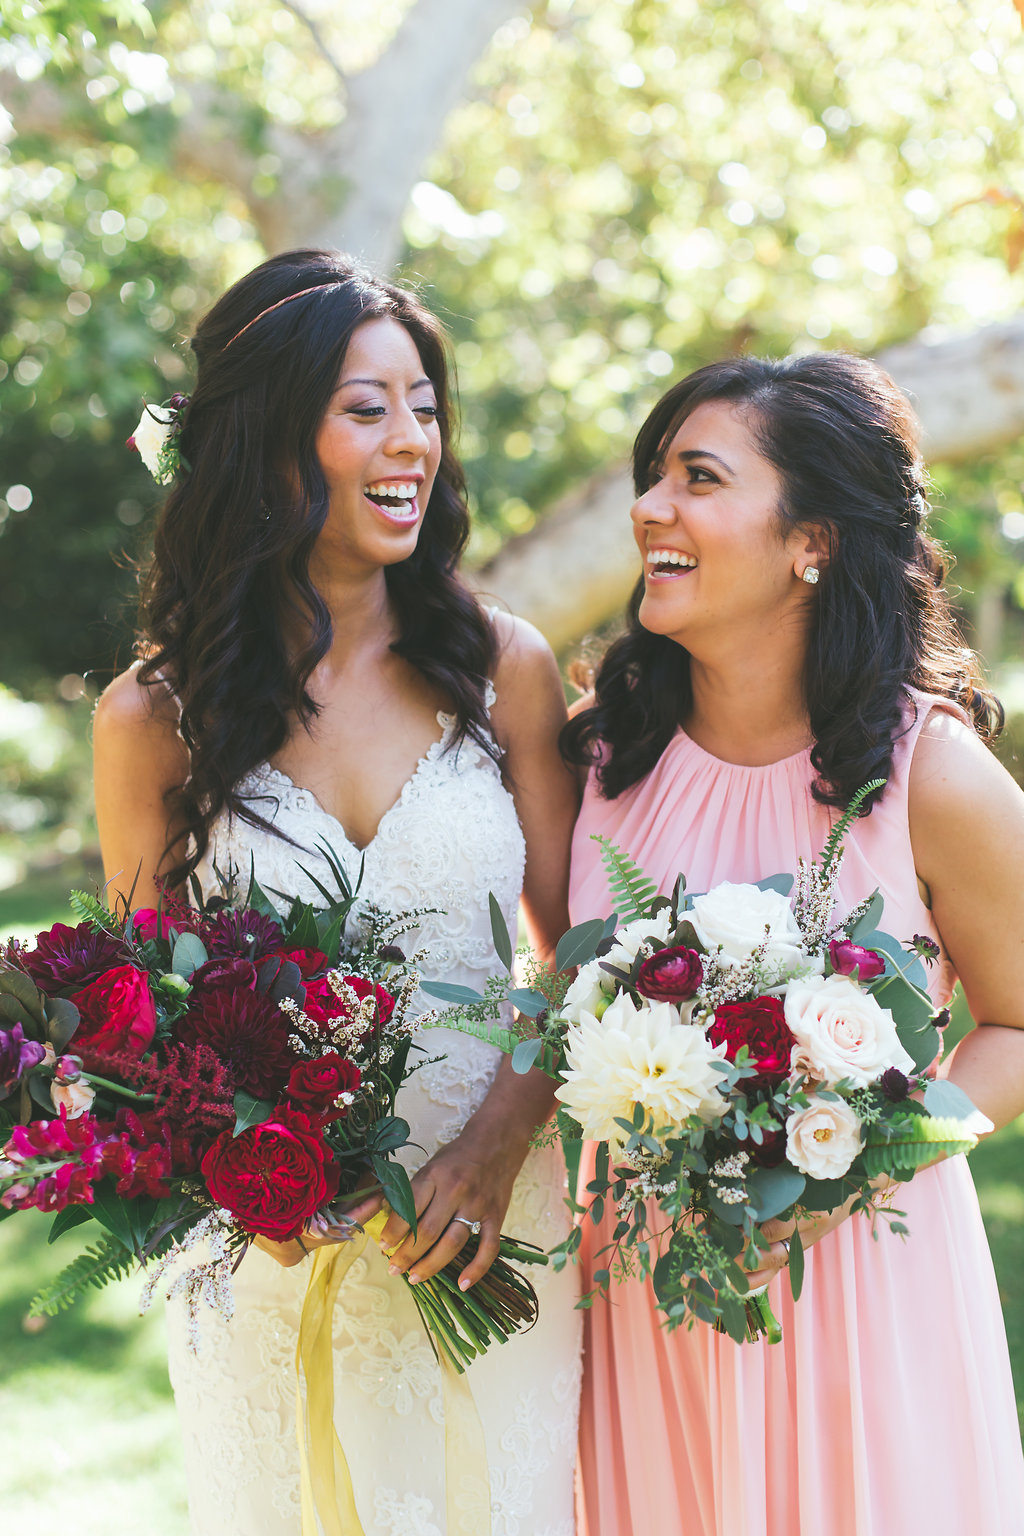 Temecula Creek Inn Moody burgundy & marsala bouquets by San Diego wedding florist, Compass Floral.